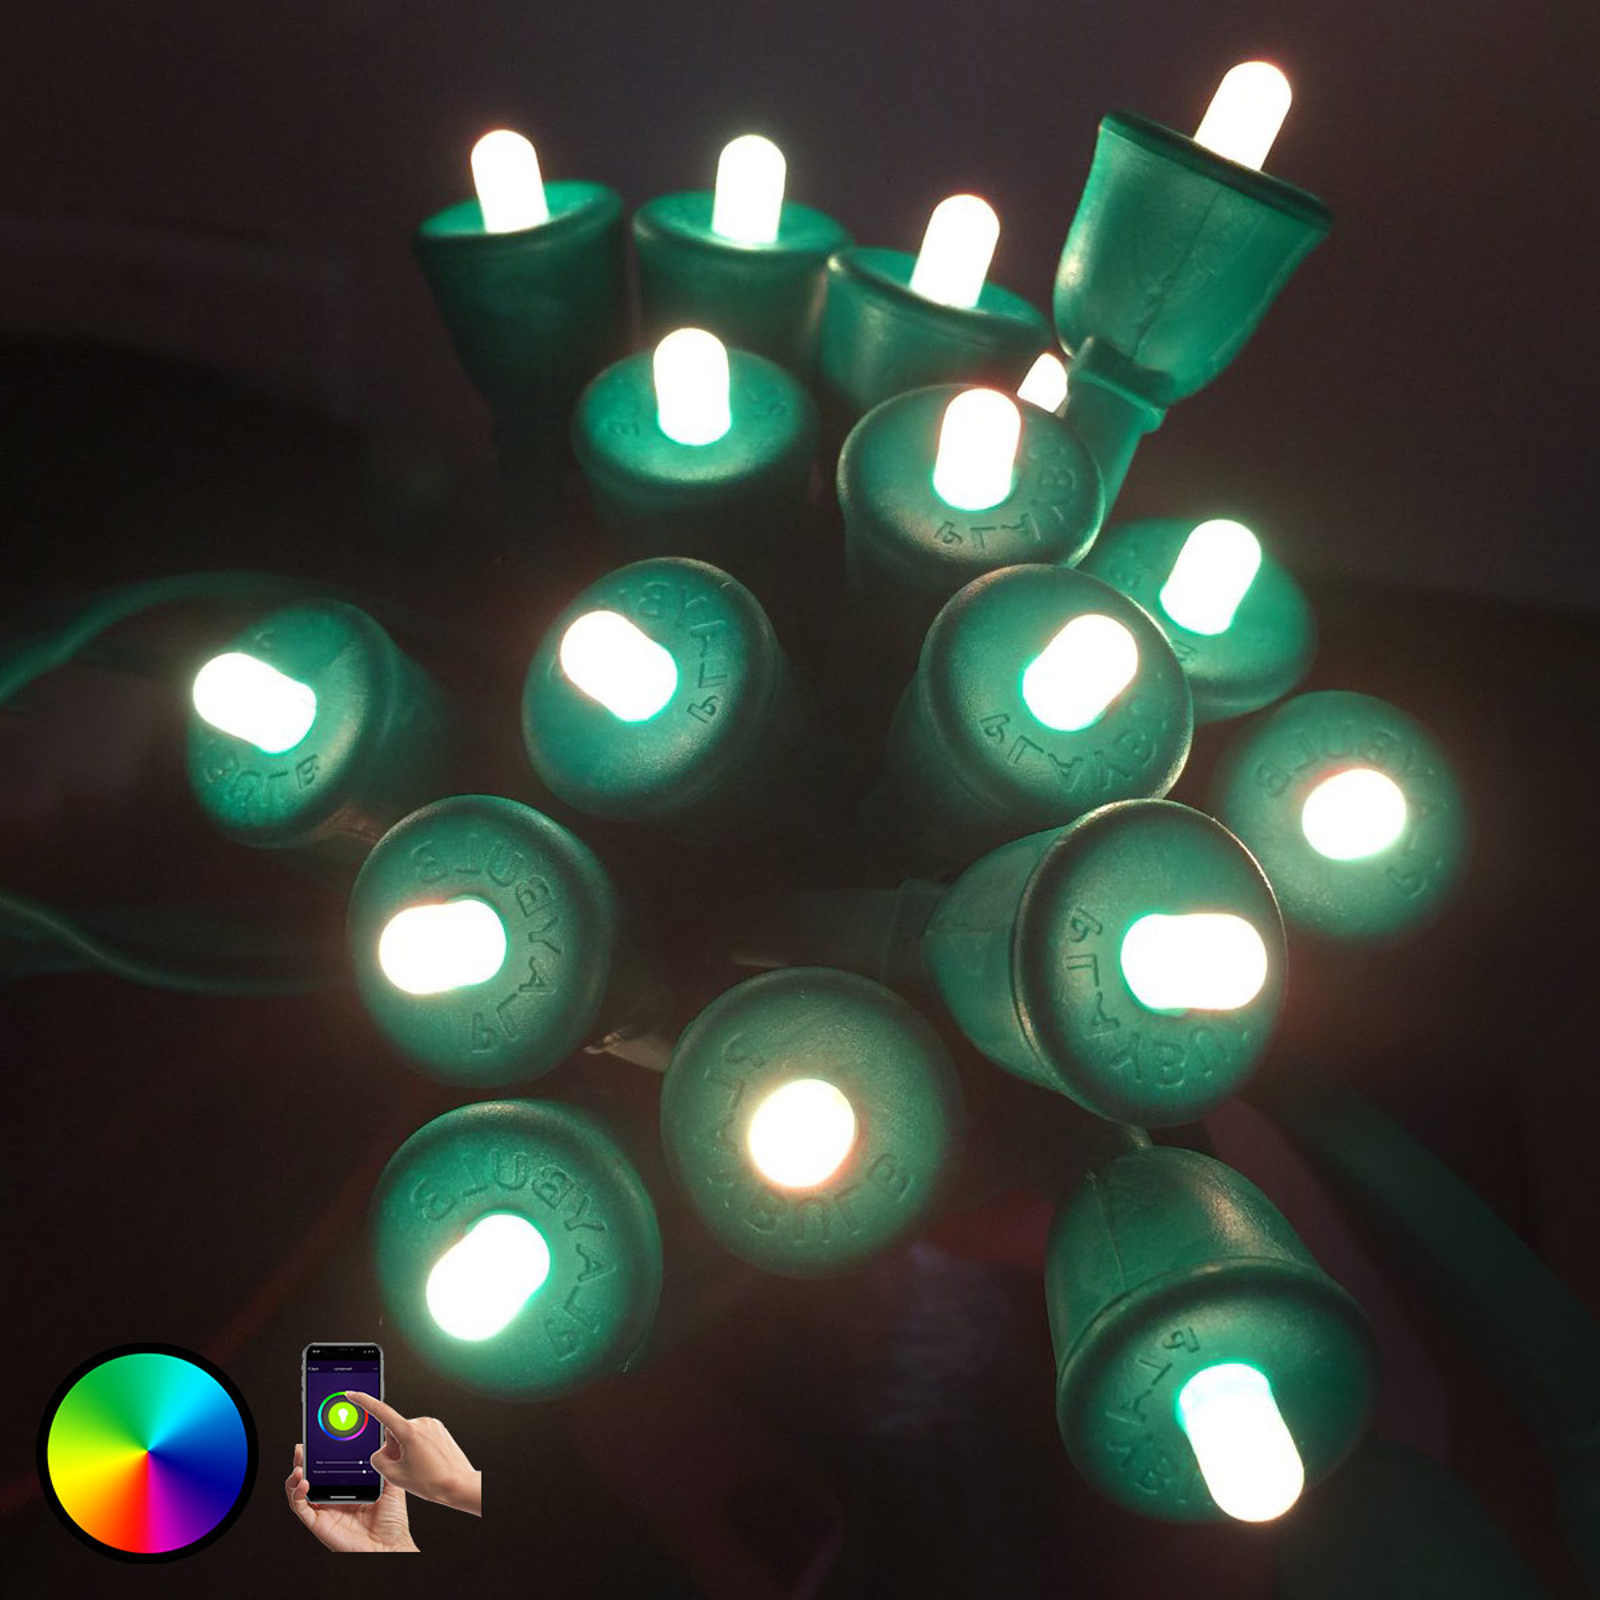 MiPow Playbulb String cadena LED, 15 m, verde